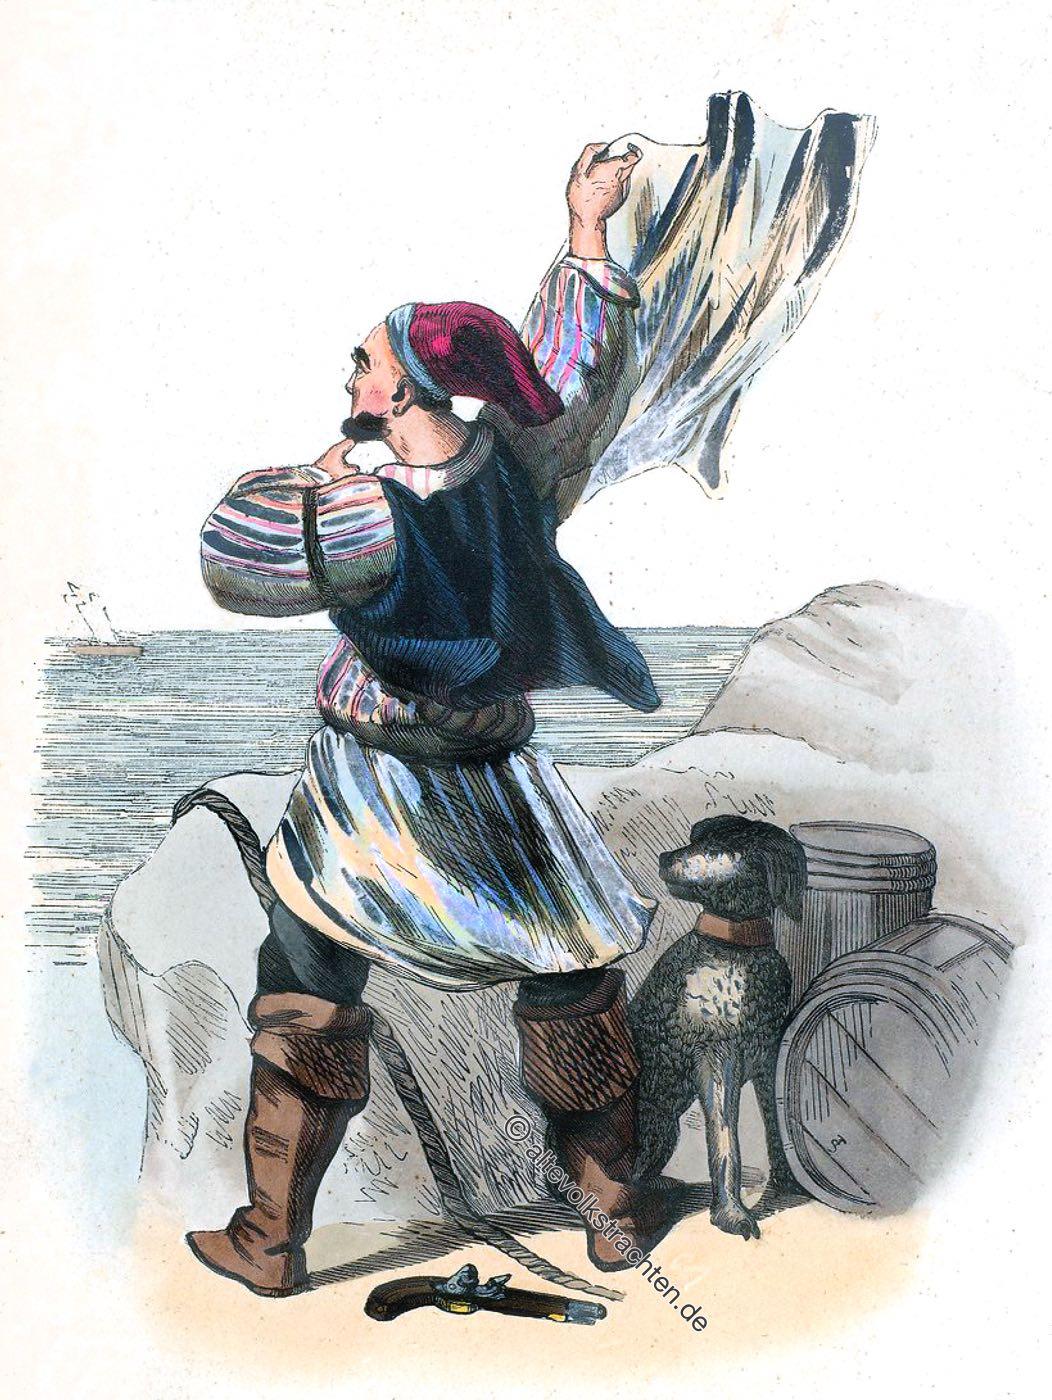 Smogleur, Smuggler, Grand Bretagne, Schmuggler, Tracht, Kostüm, Kleidung, Auguste Wahlen